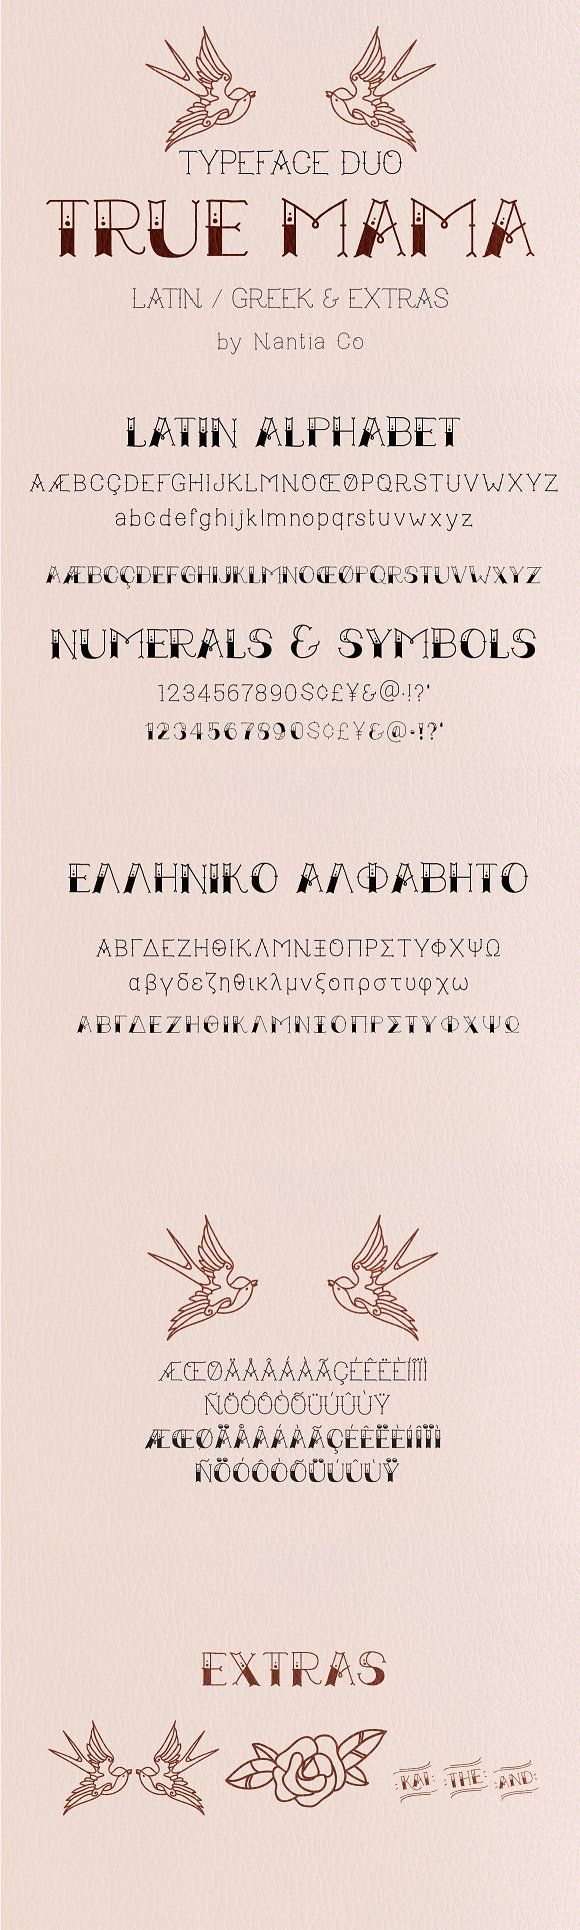 true mama   typeface duo by nantia on @creativemarket   fancy